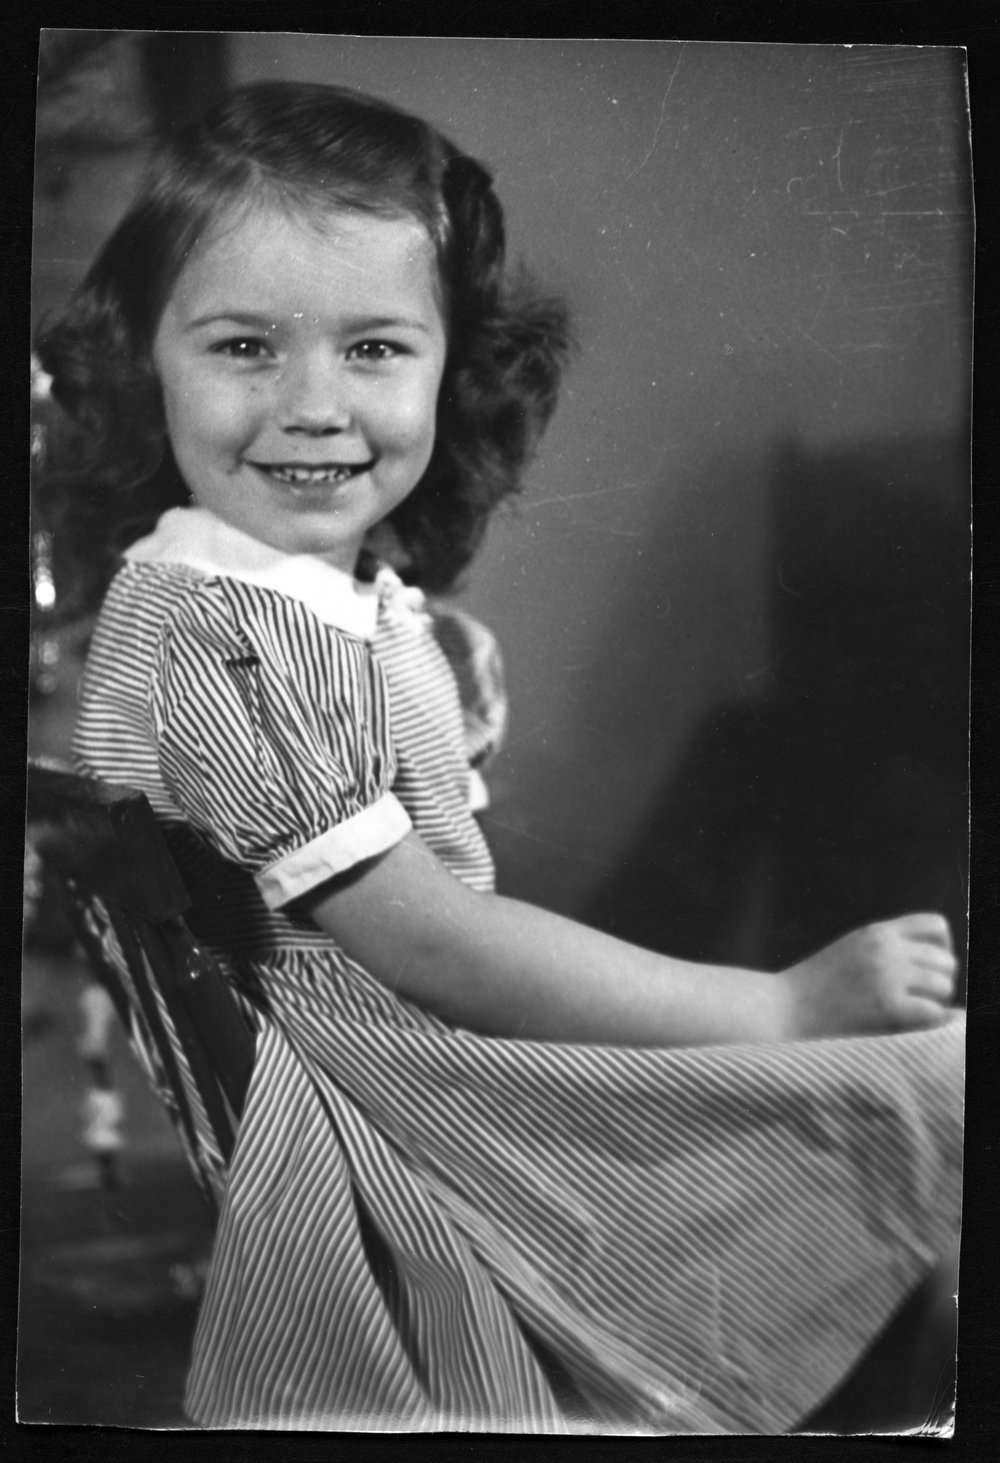 Cynthia Tilson Conklin Rogers - 1